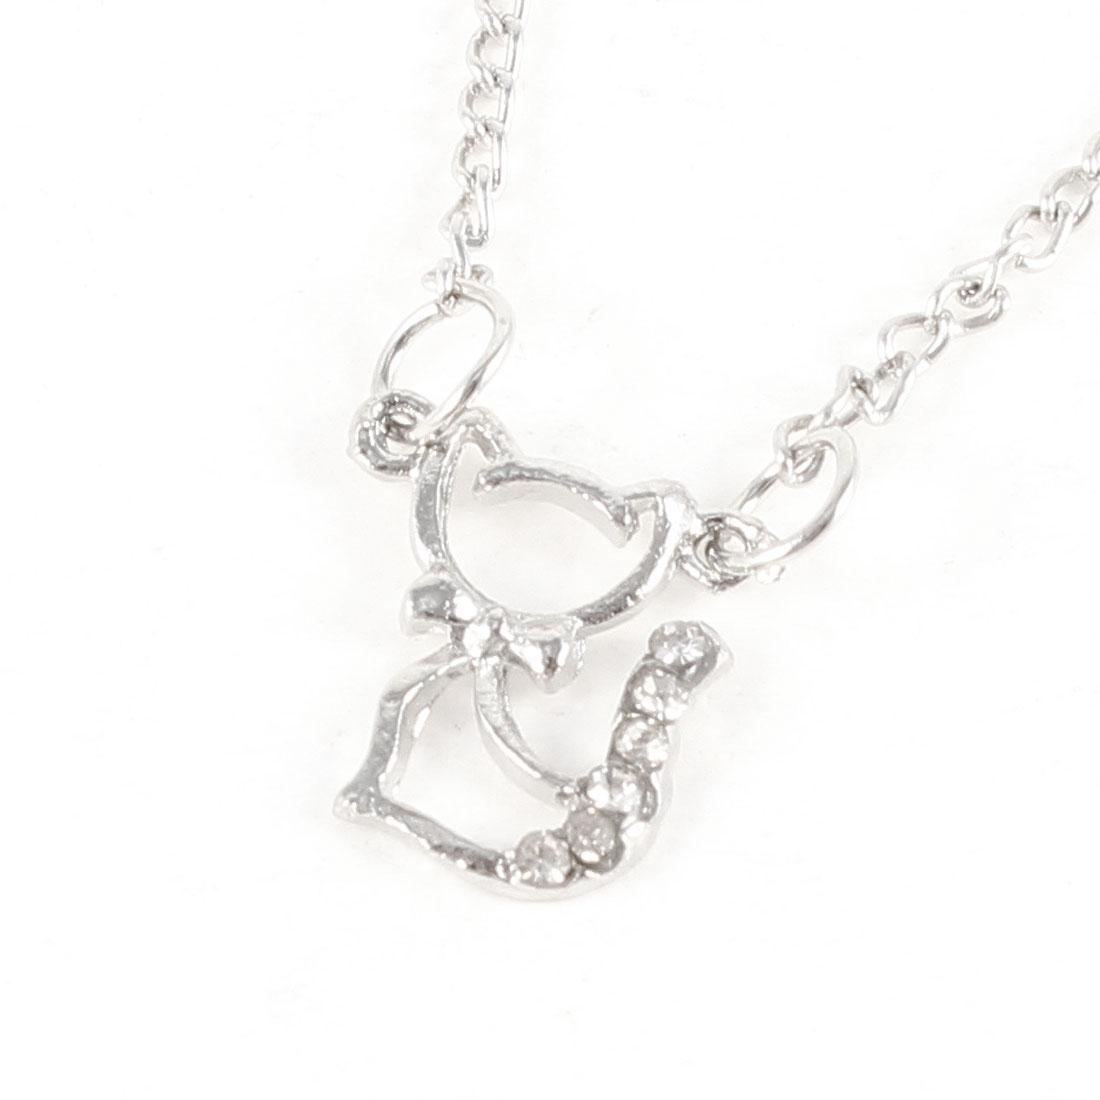 Lady Neck Decor Silver Tone Hollow Out Cat Pendant Slim Chain Necklace